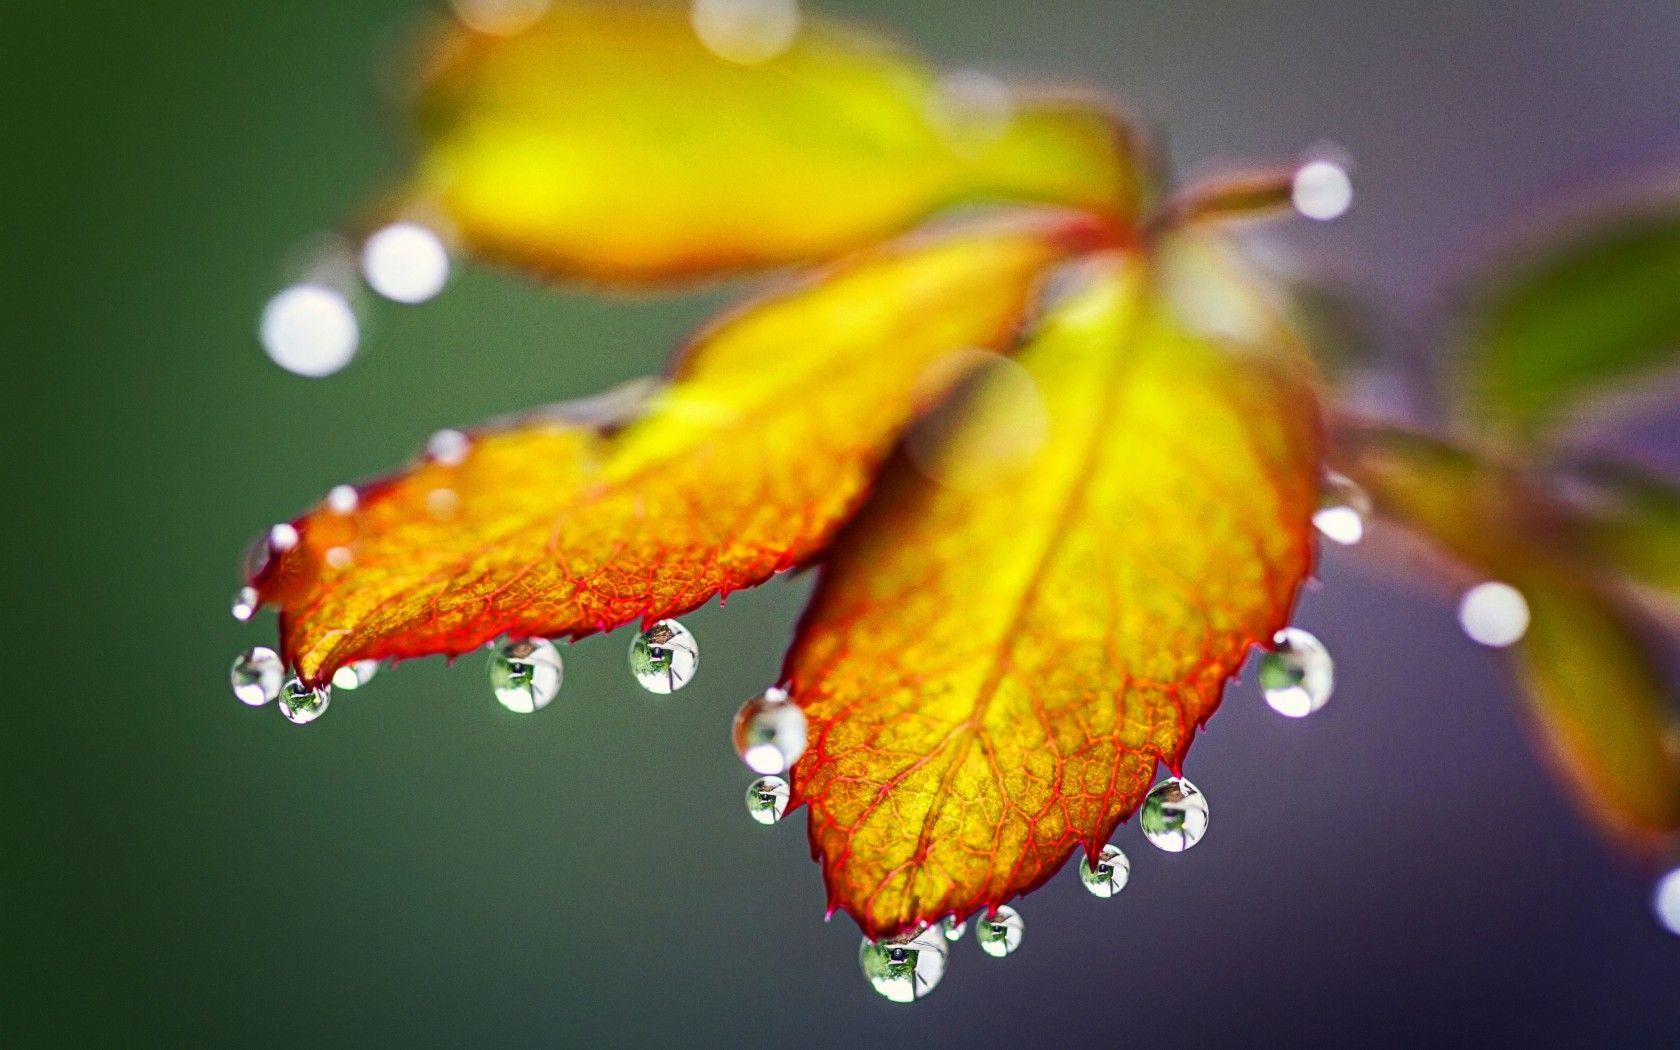 Macro Drops Rain Morning Autumn Leaves Nature Hd Leaf Nature Leaves Water Drop On Leaf